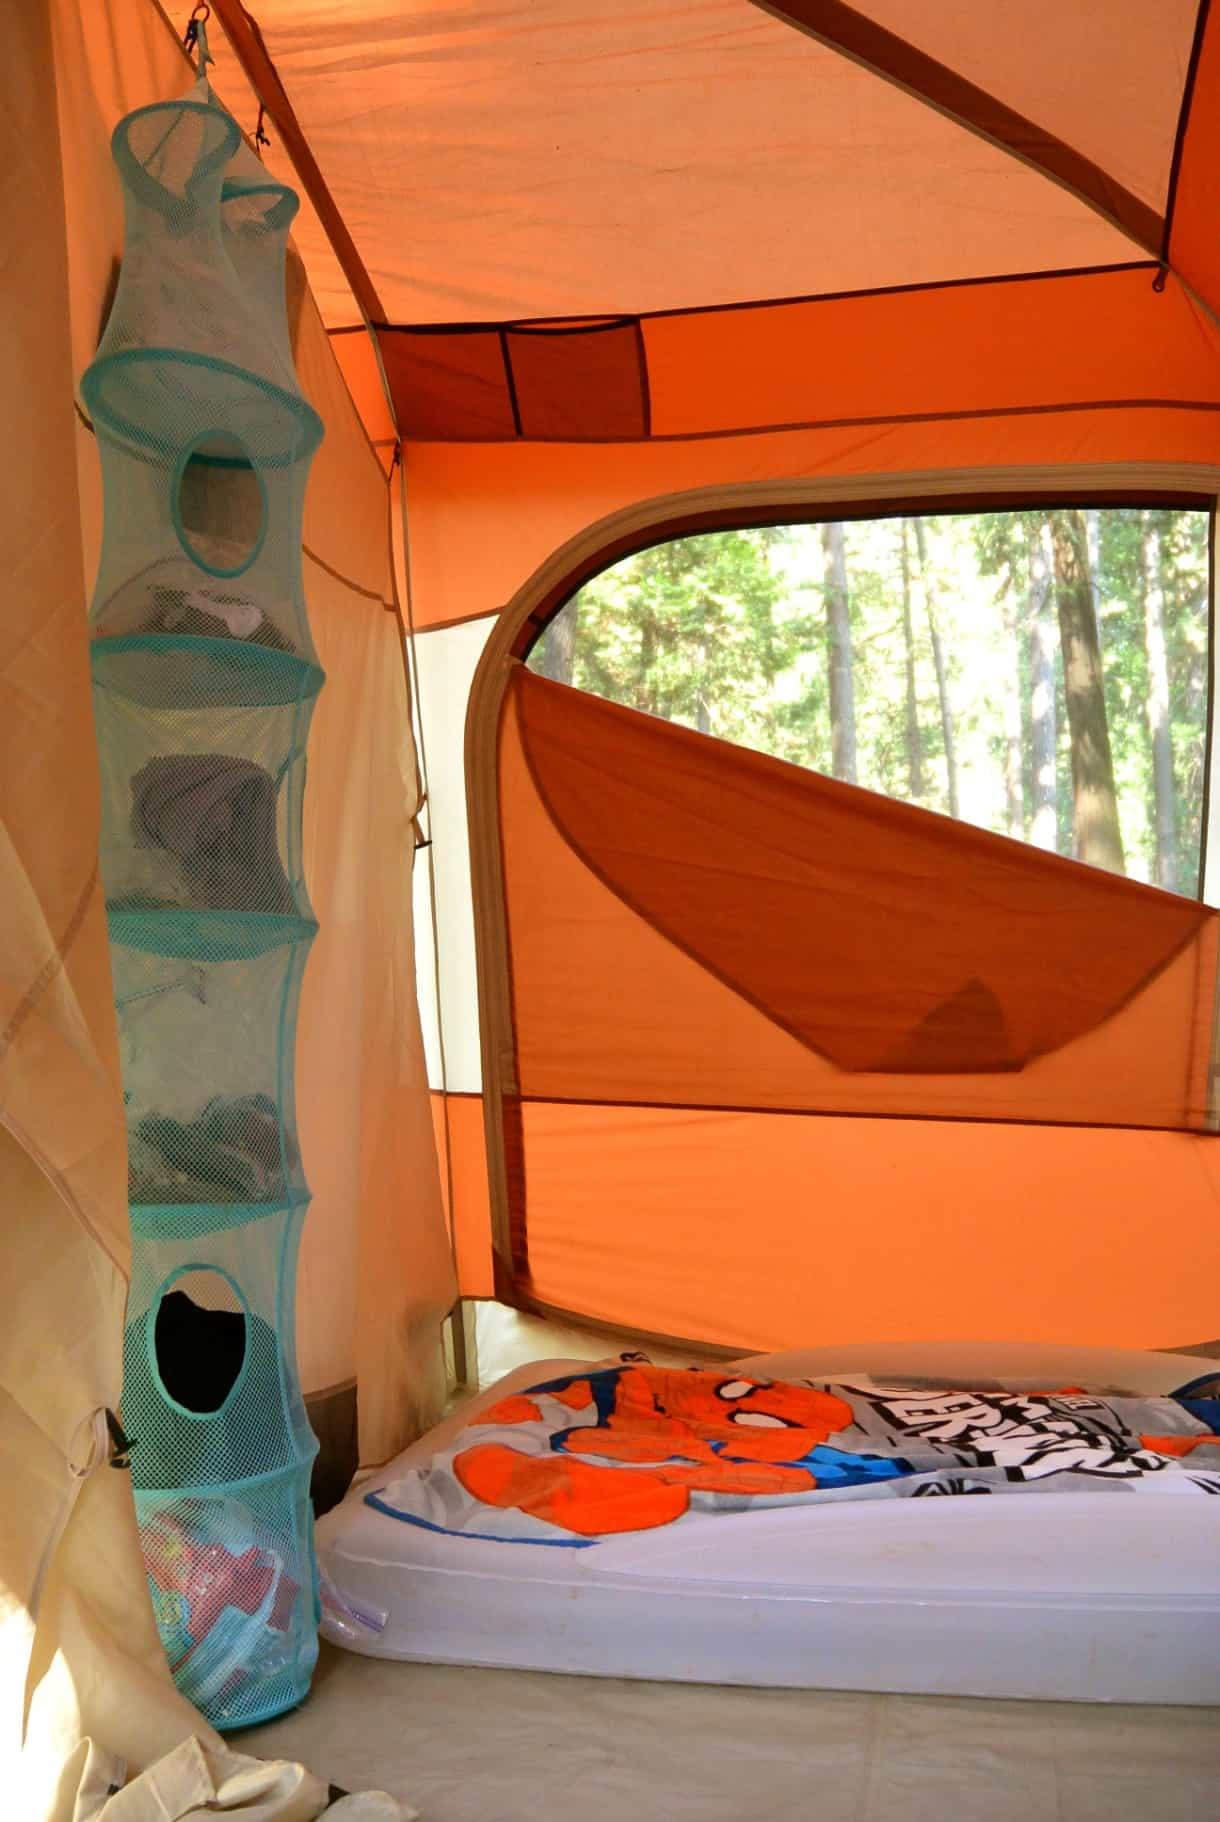 Camping Hacks 7